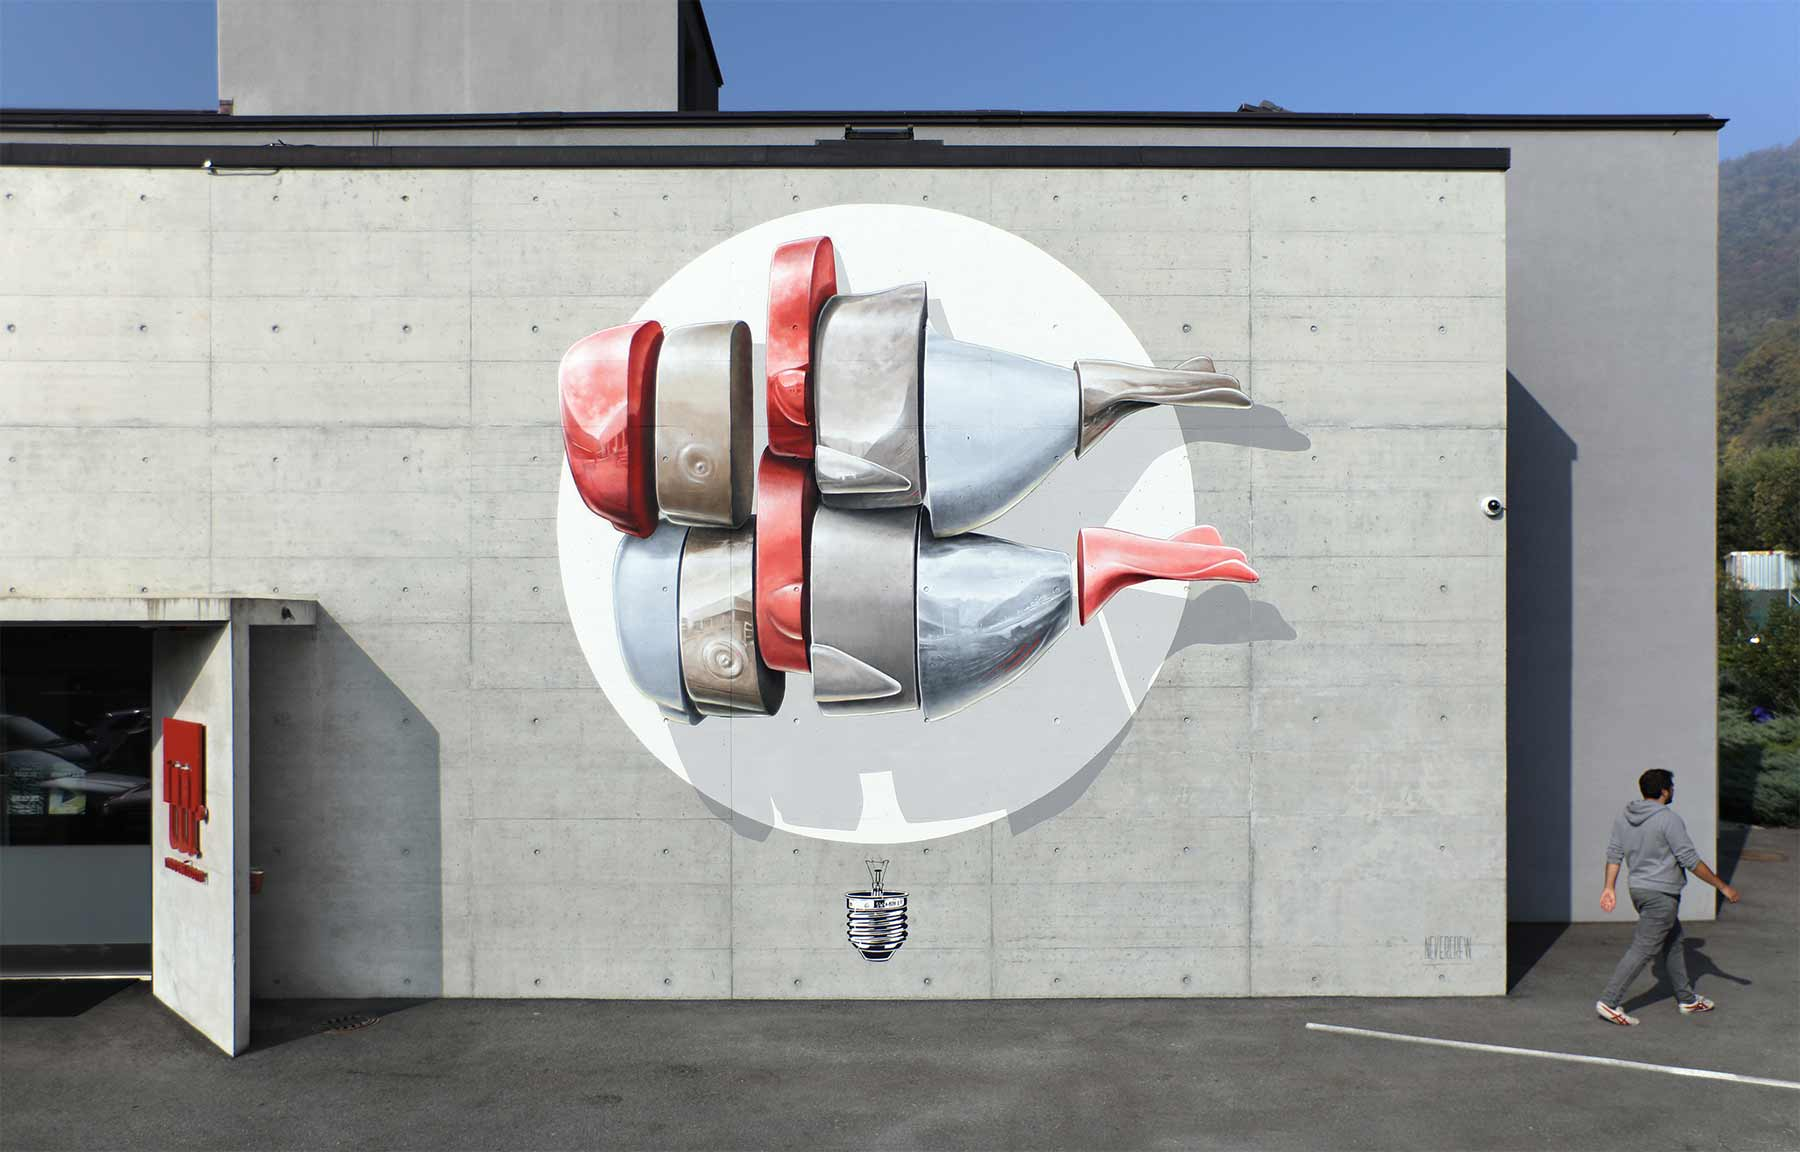 Timelapse: Mural-Malen mit der Nevercrew Nevercrew-disposing-machine